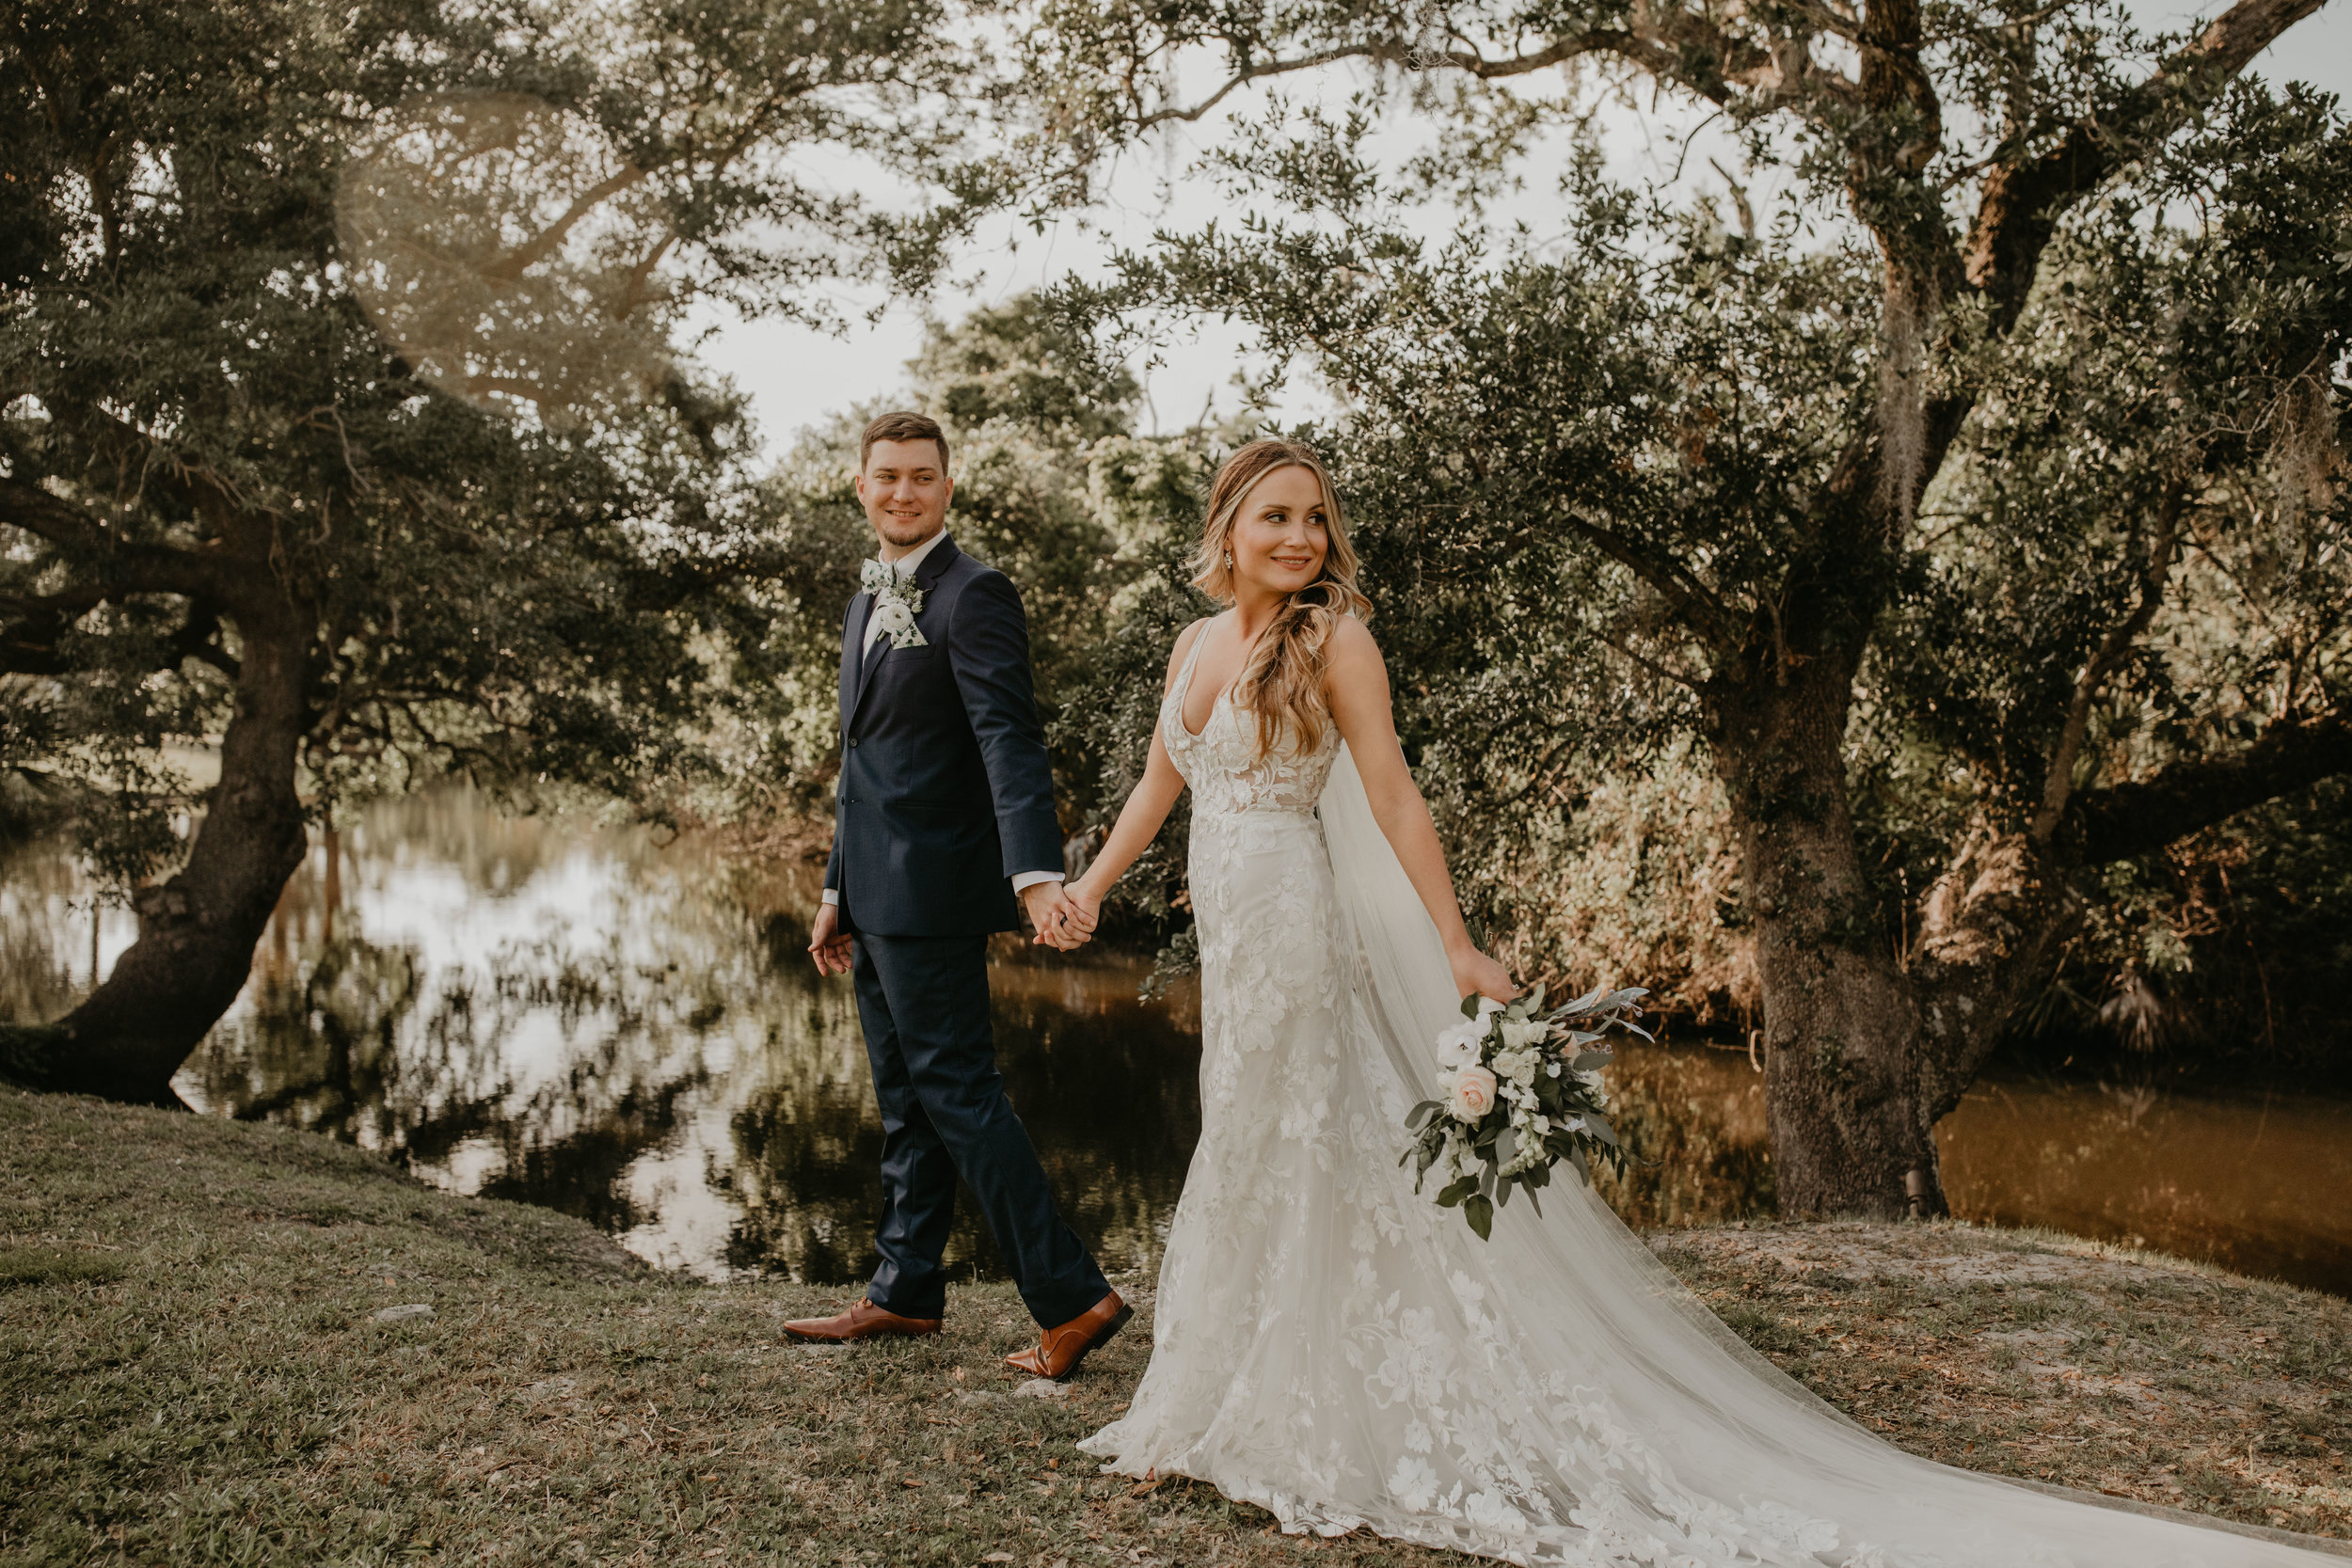 Up The Creek Farms Malabar Florida-wedding-Caitlin and Michael705.jpg